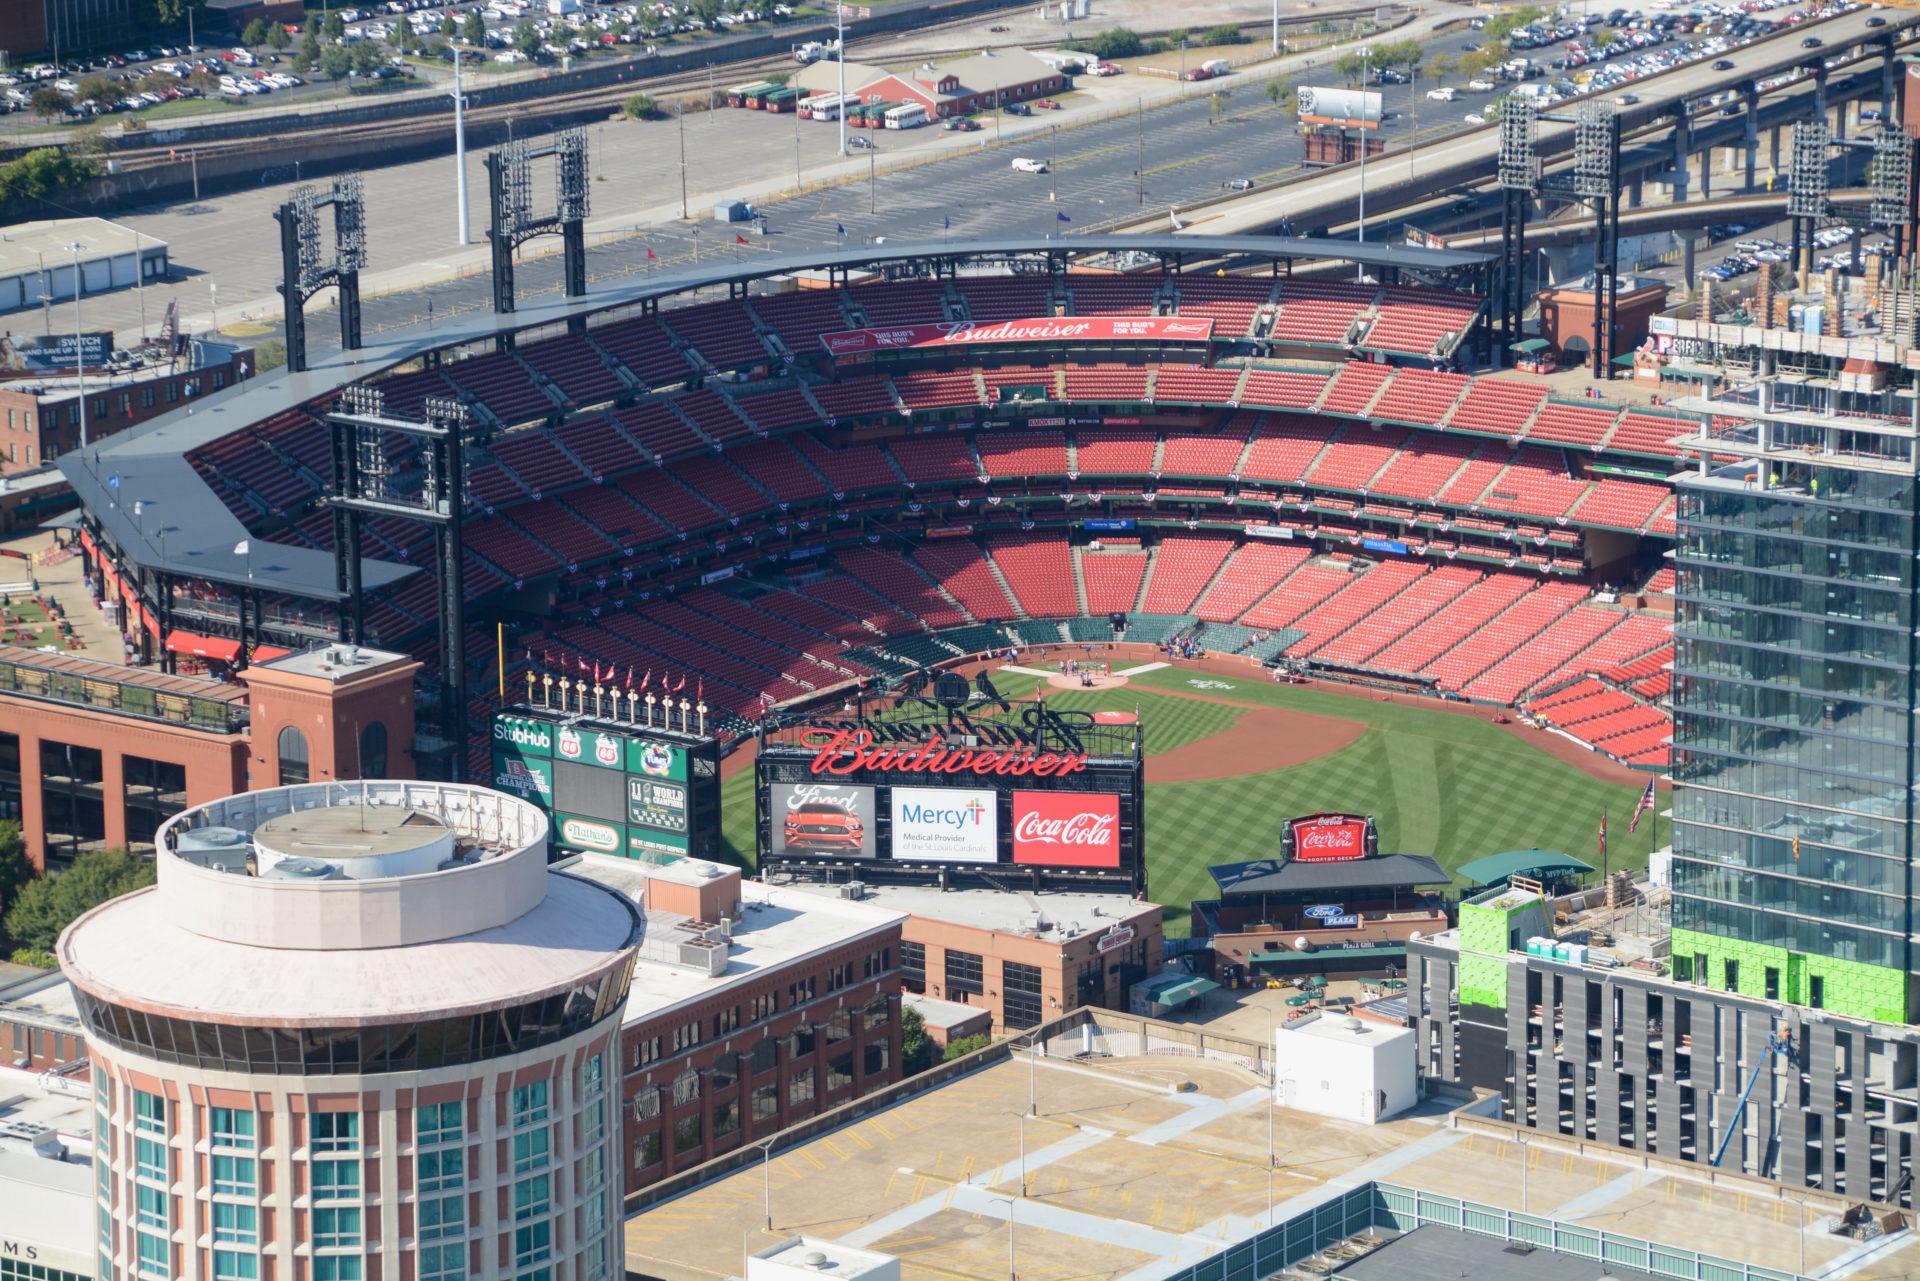 Das Stadion des Saint Louis Cardinals aus dem Gateway Arch